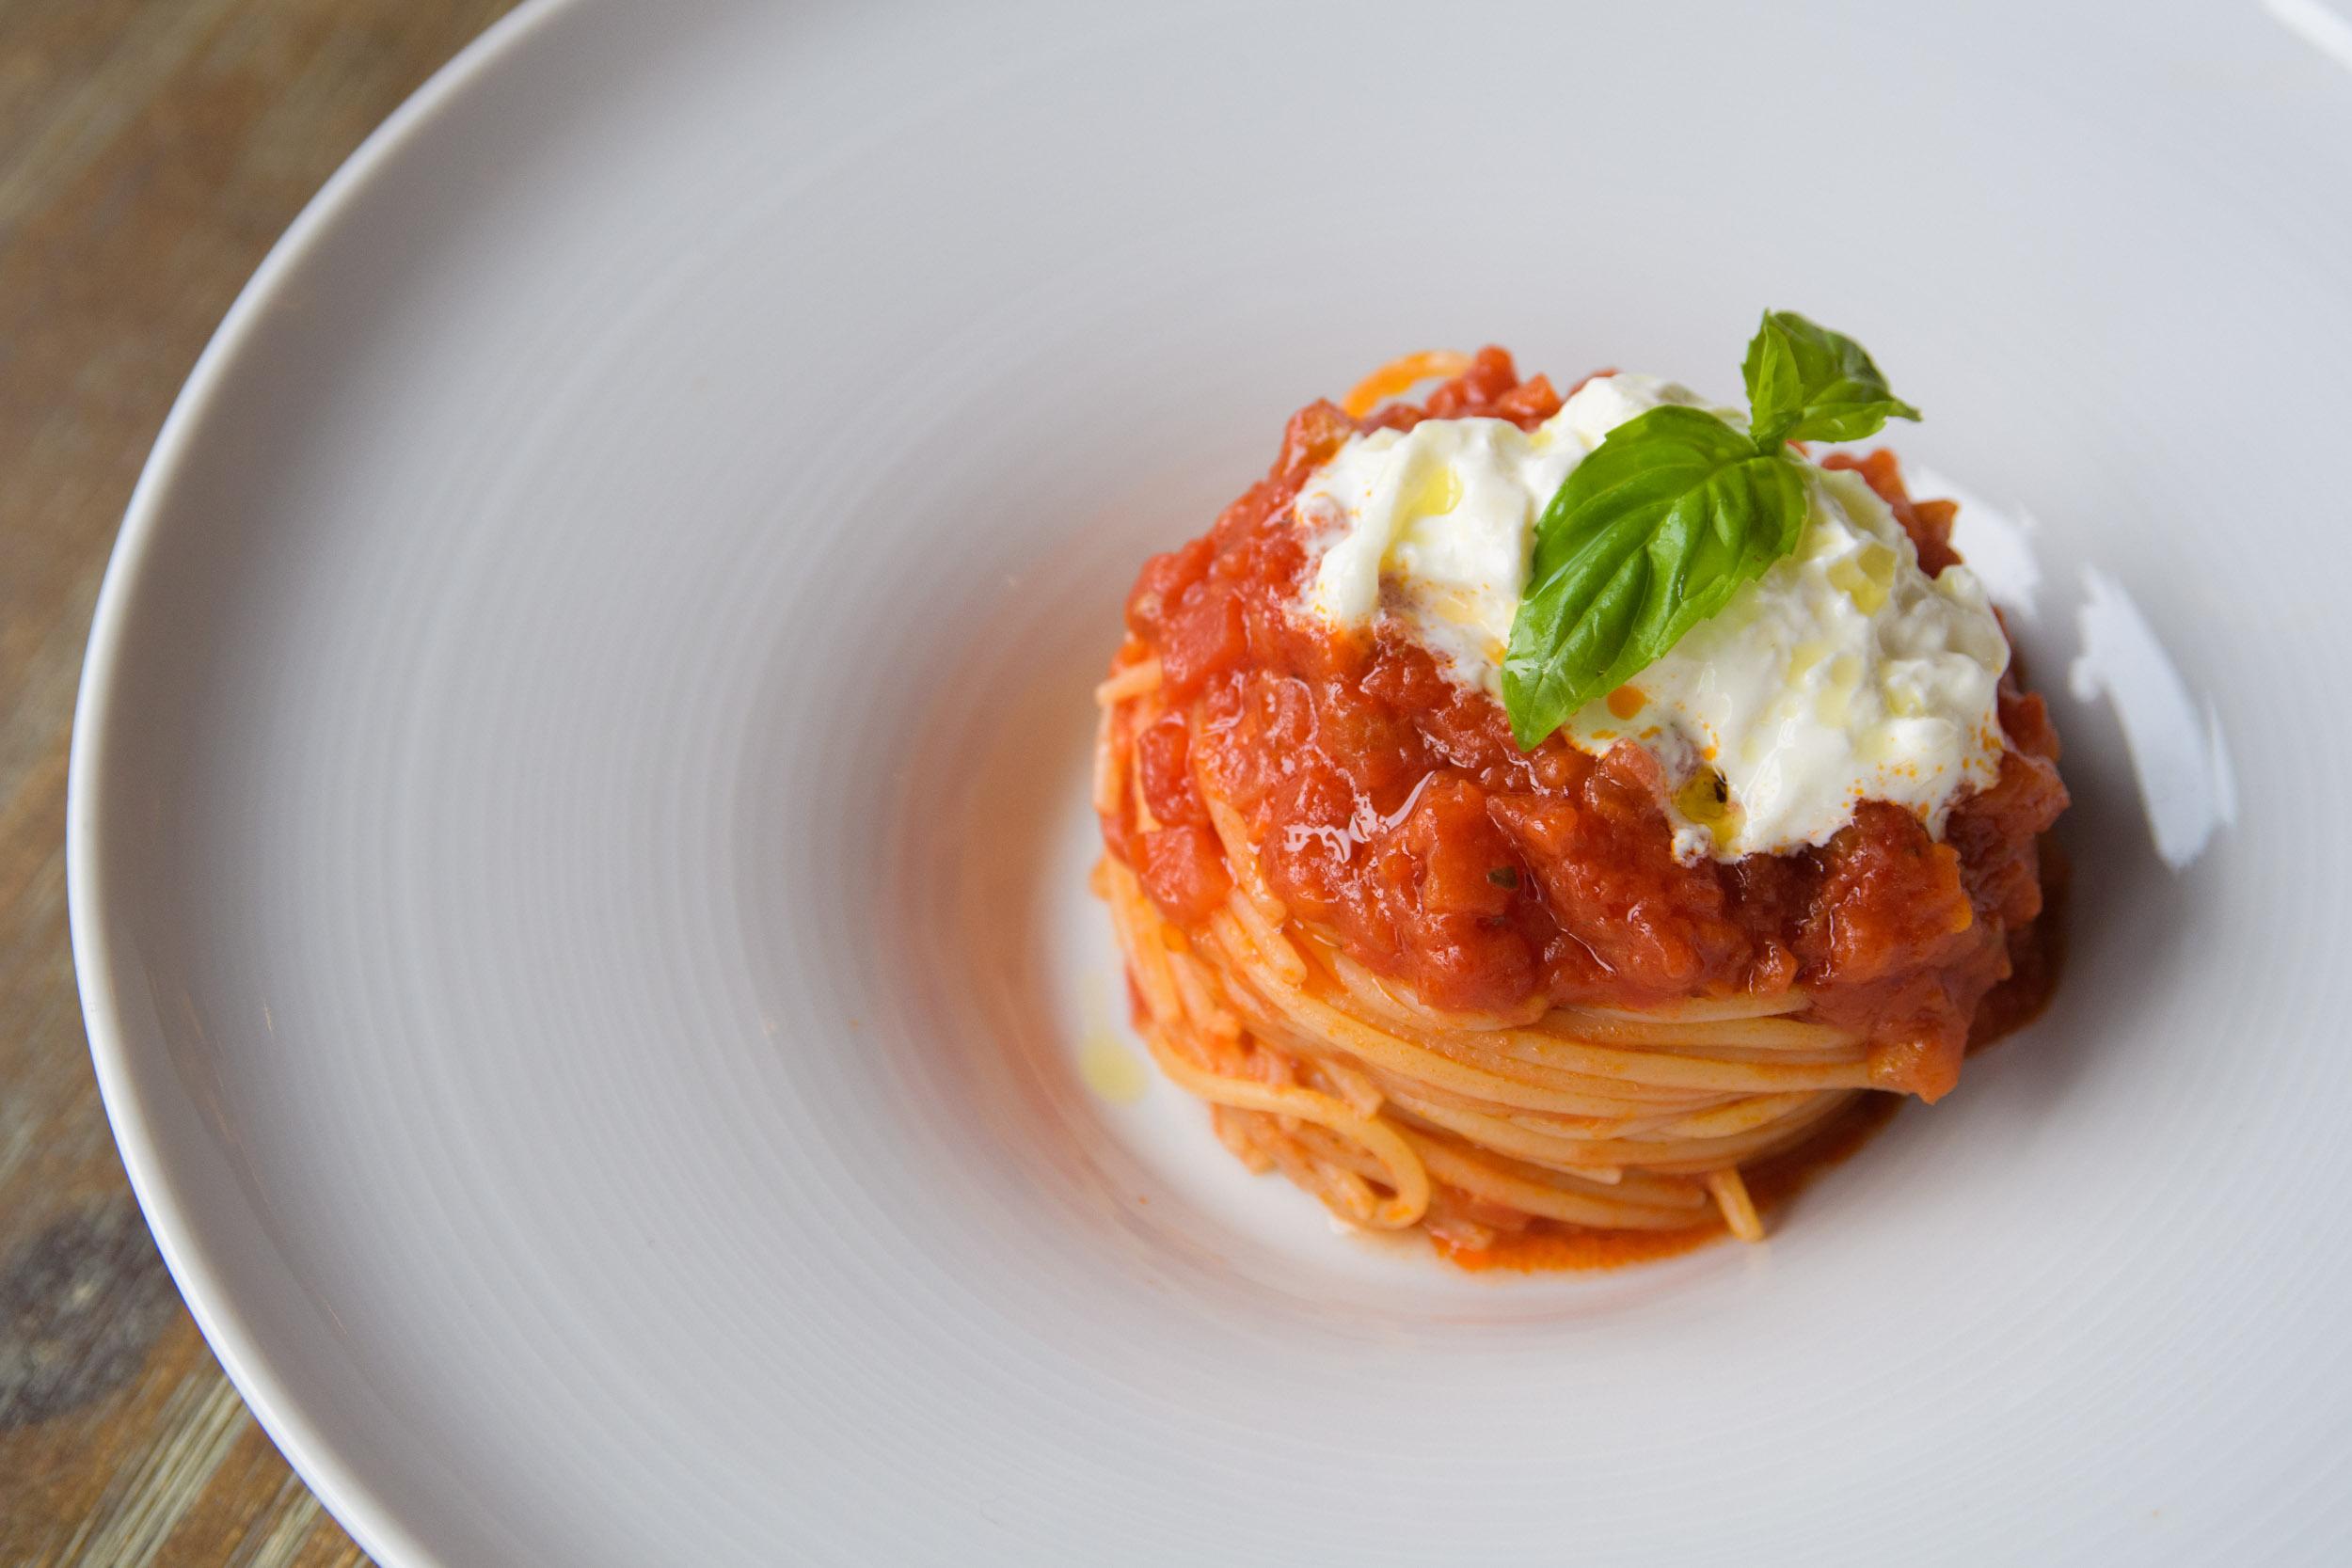 Ad Majora Caffè - Spaghetti al pomodoro